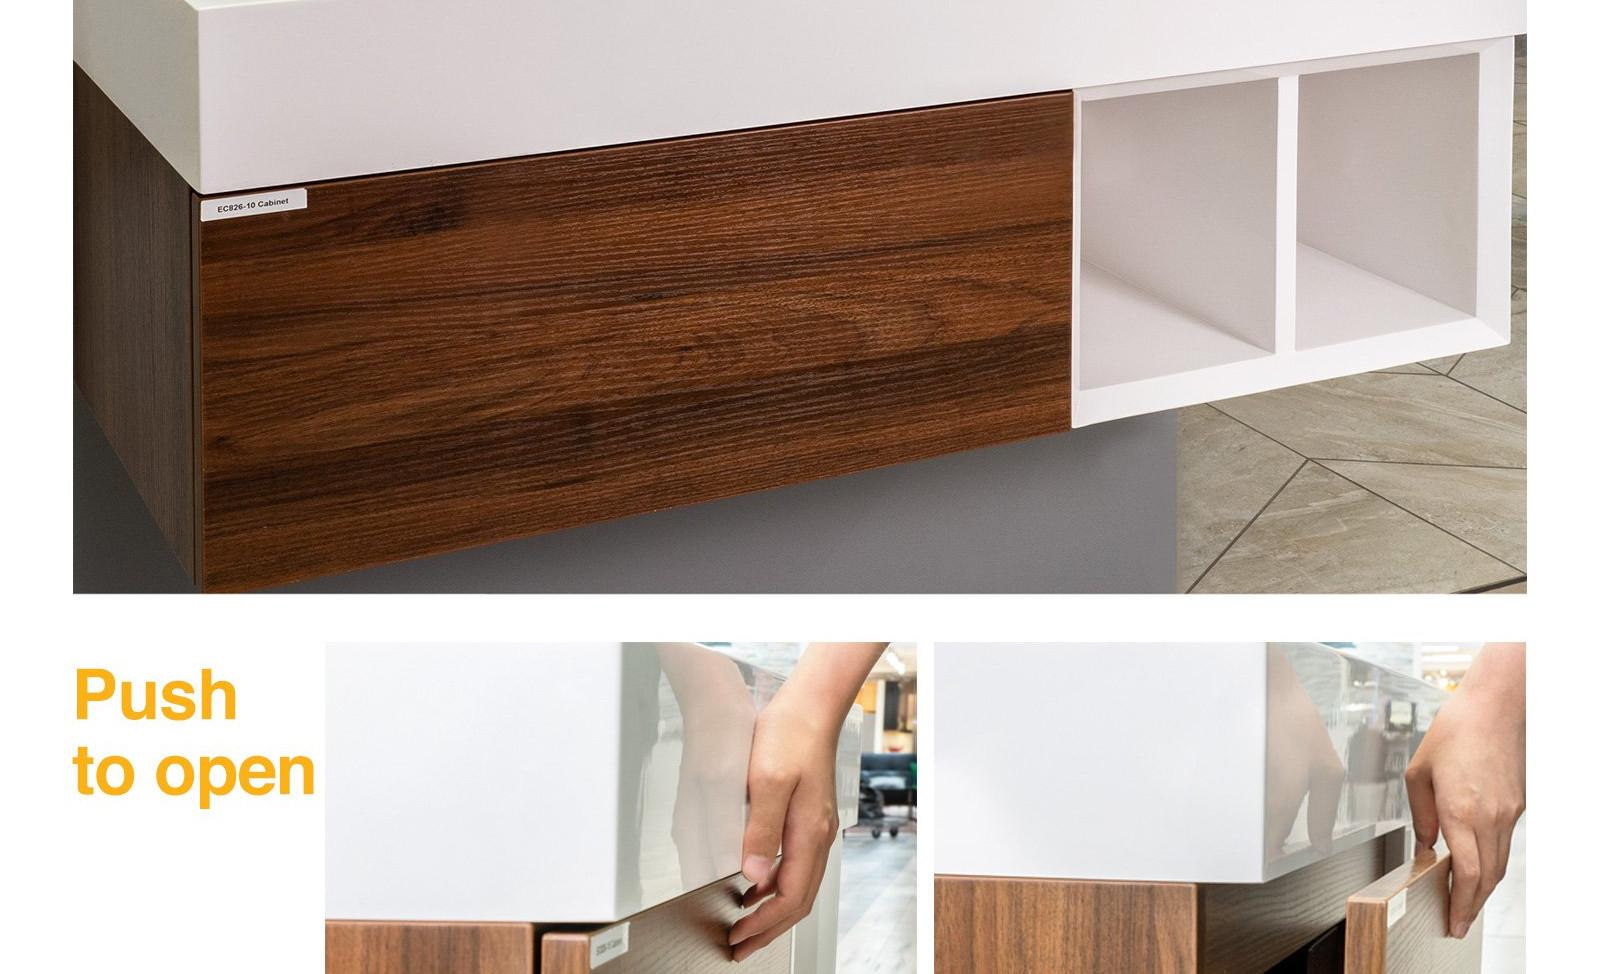 EC826-10 Cabinet